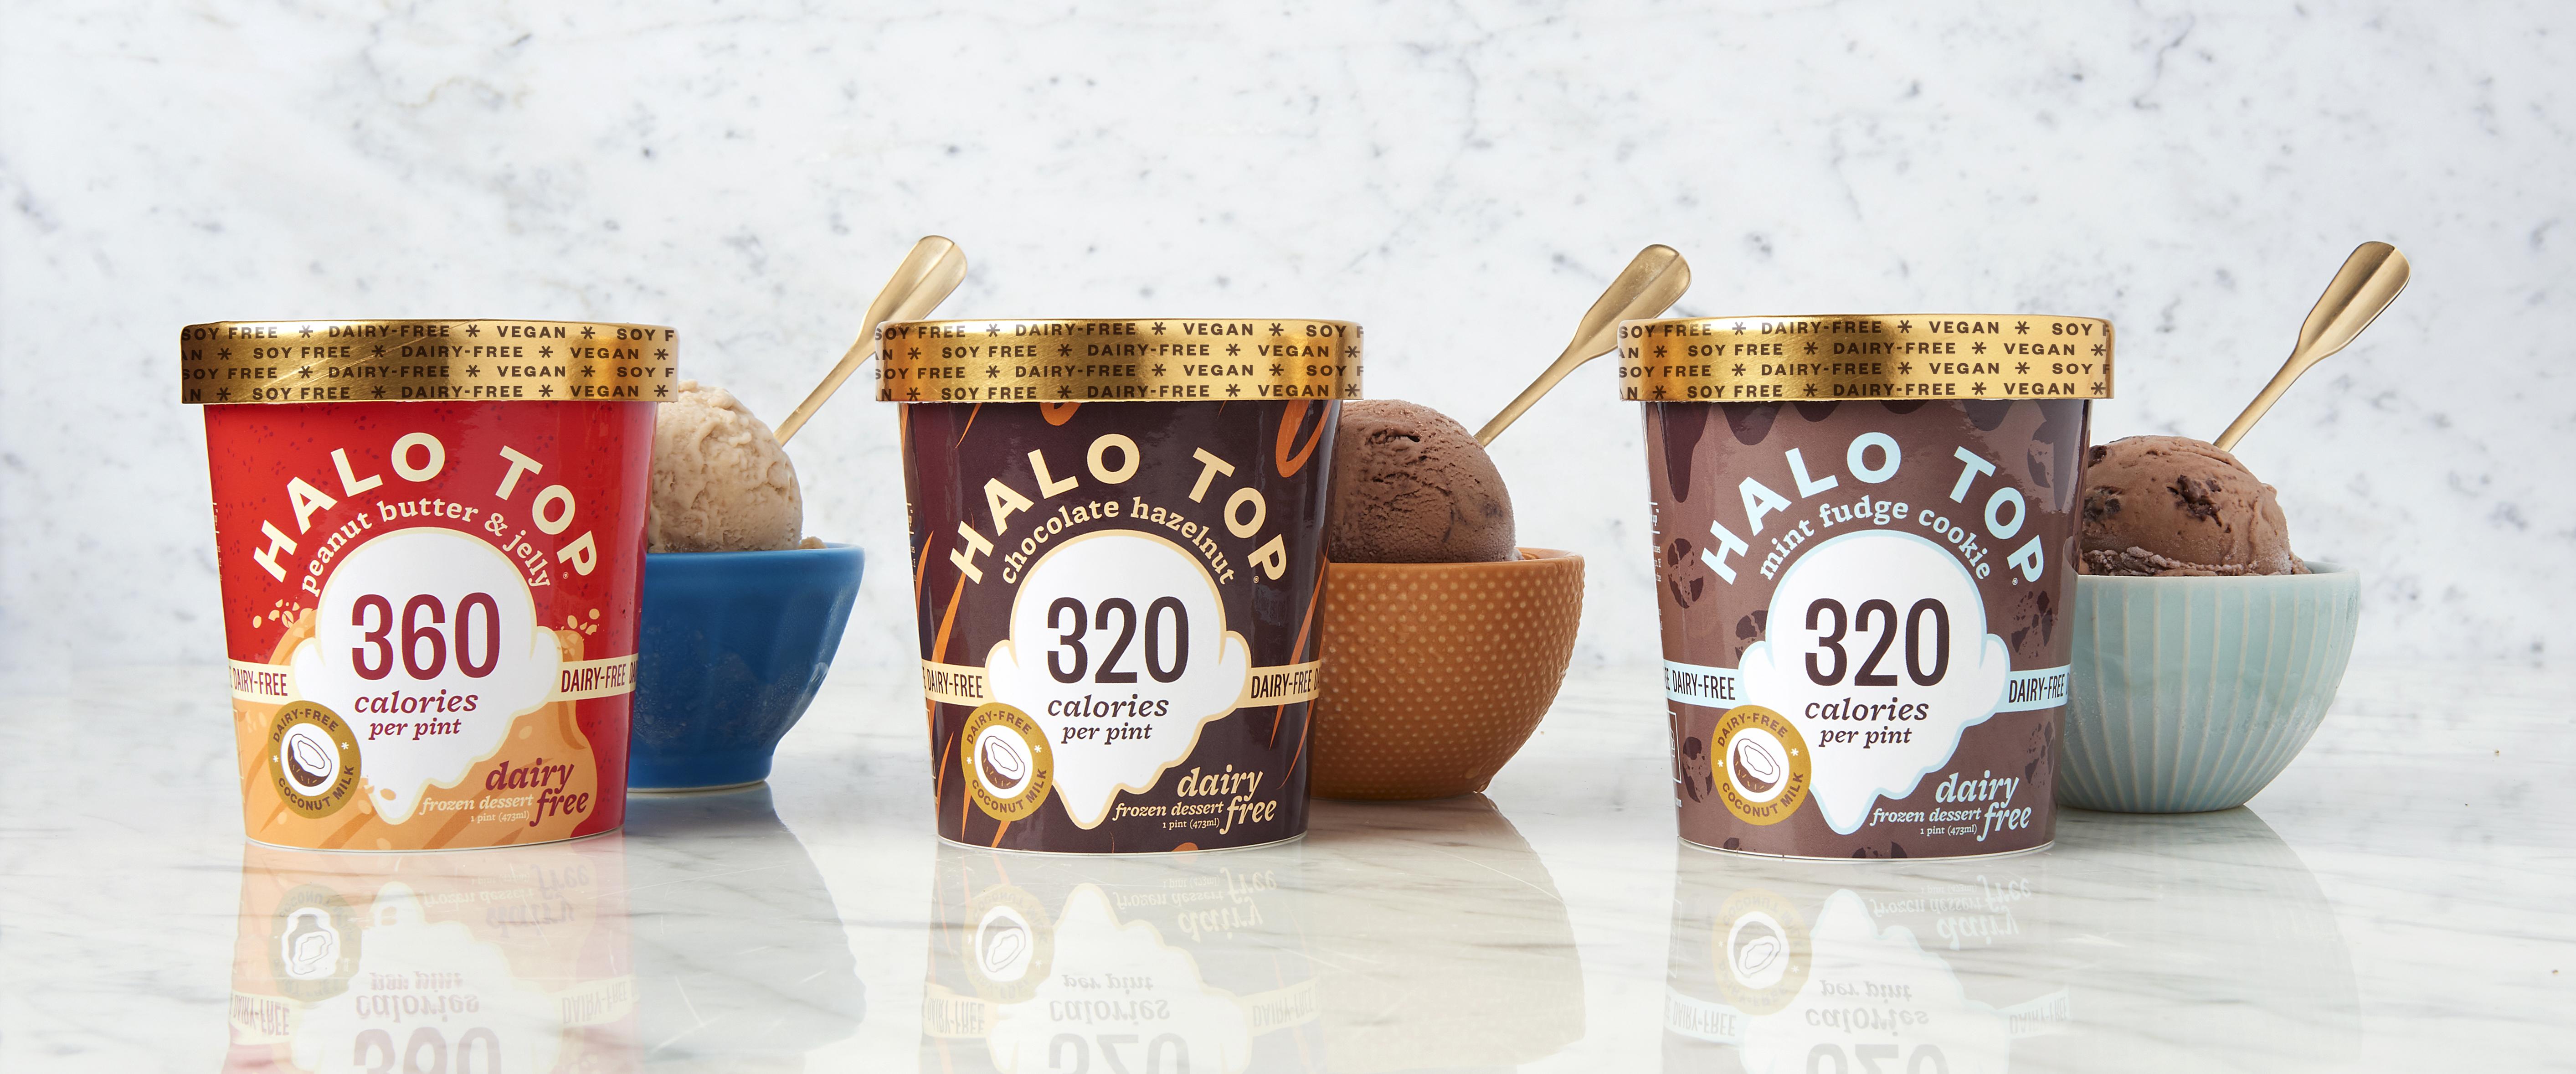 Vegan Ice Cream Flavors and Brands (Updated May 2019) | PETA